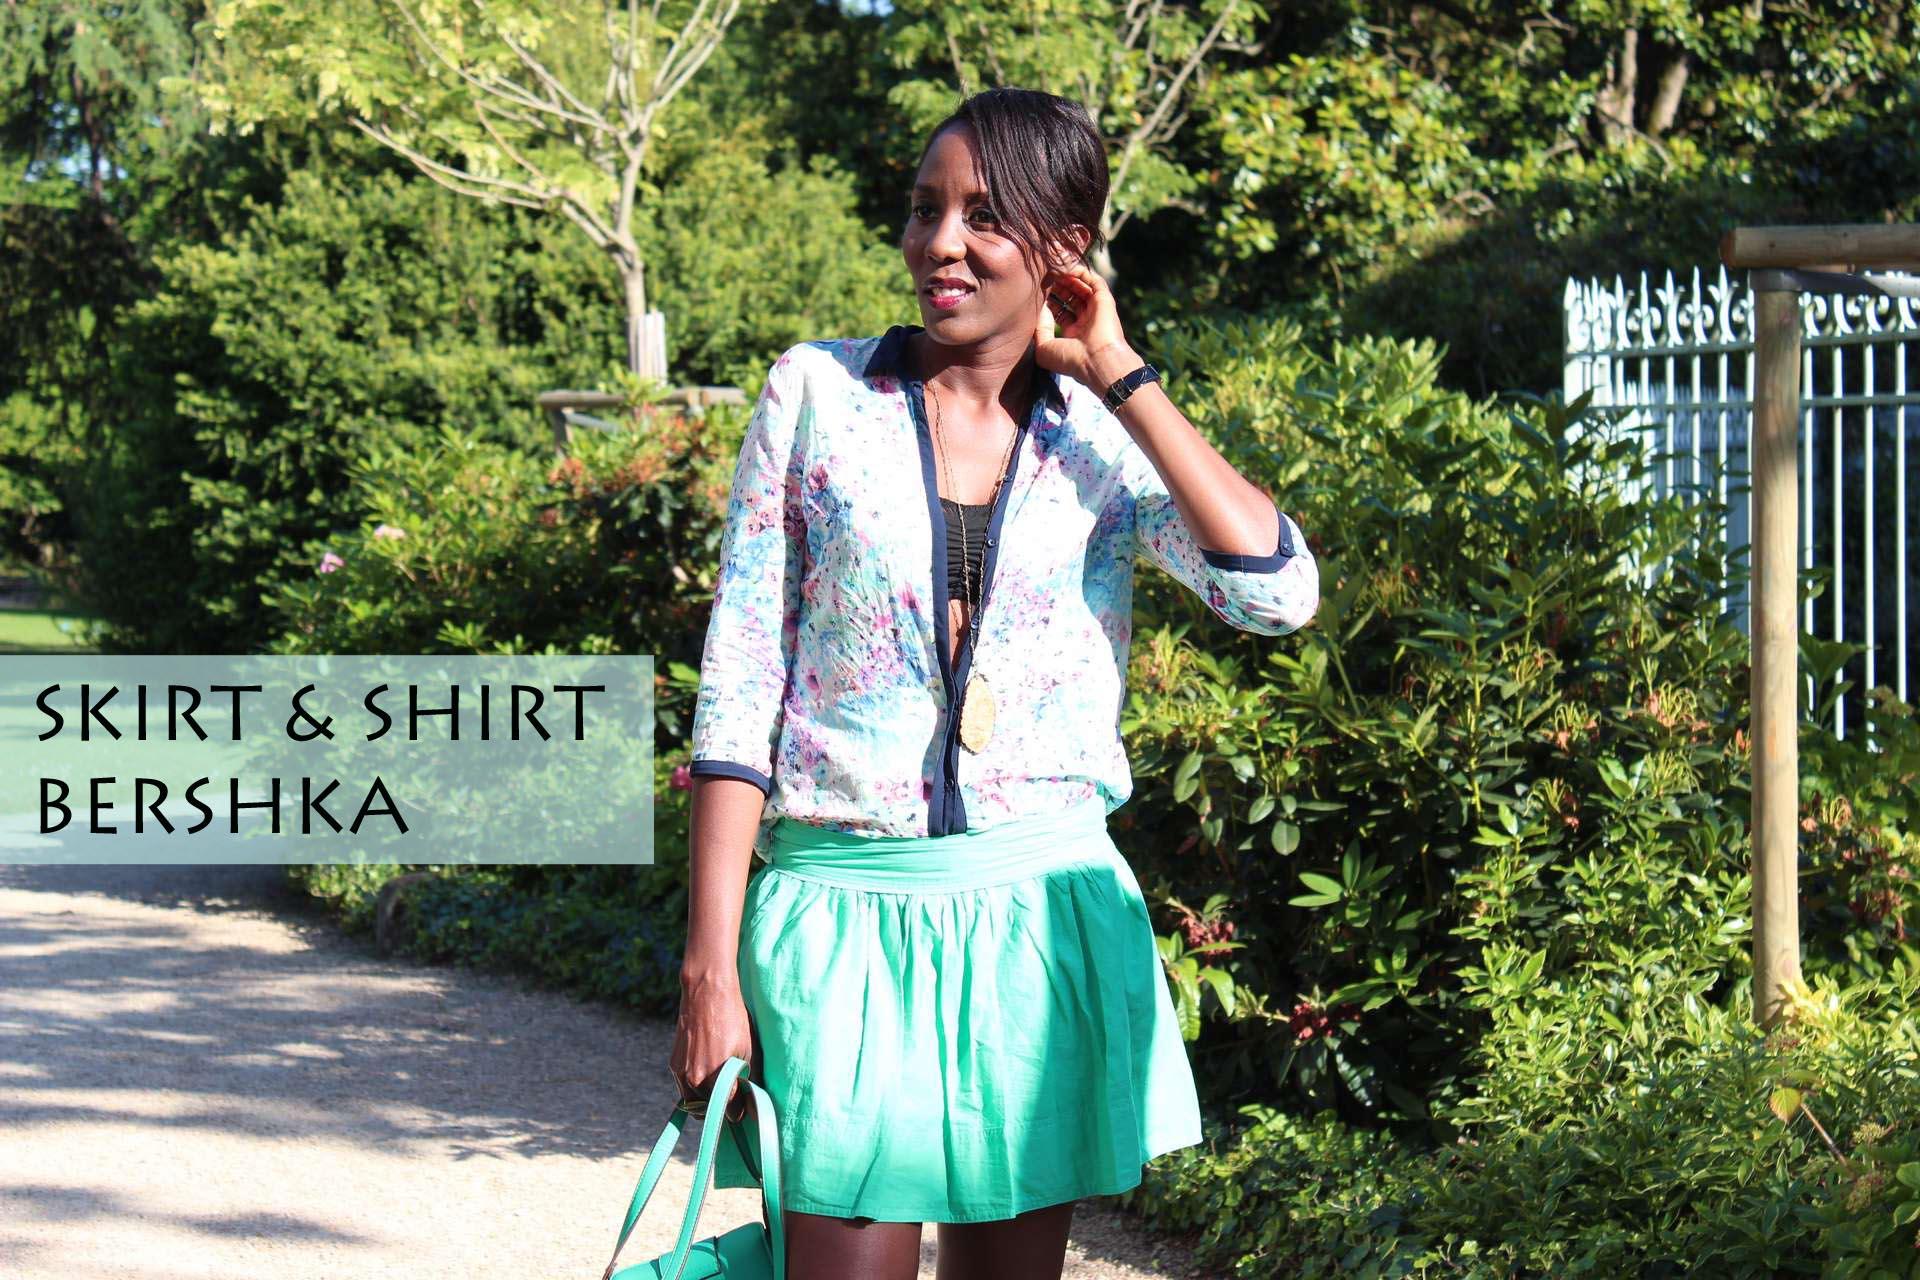 nunaavane-green-skater-skirt-fashion-summer-outfit-beauty-blogger-breshka-claire's-etam-accessorize-choose-to-be-beautiful-ctbb3